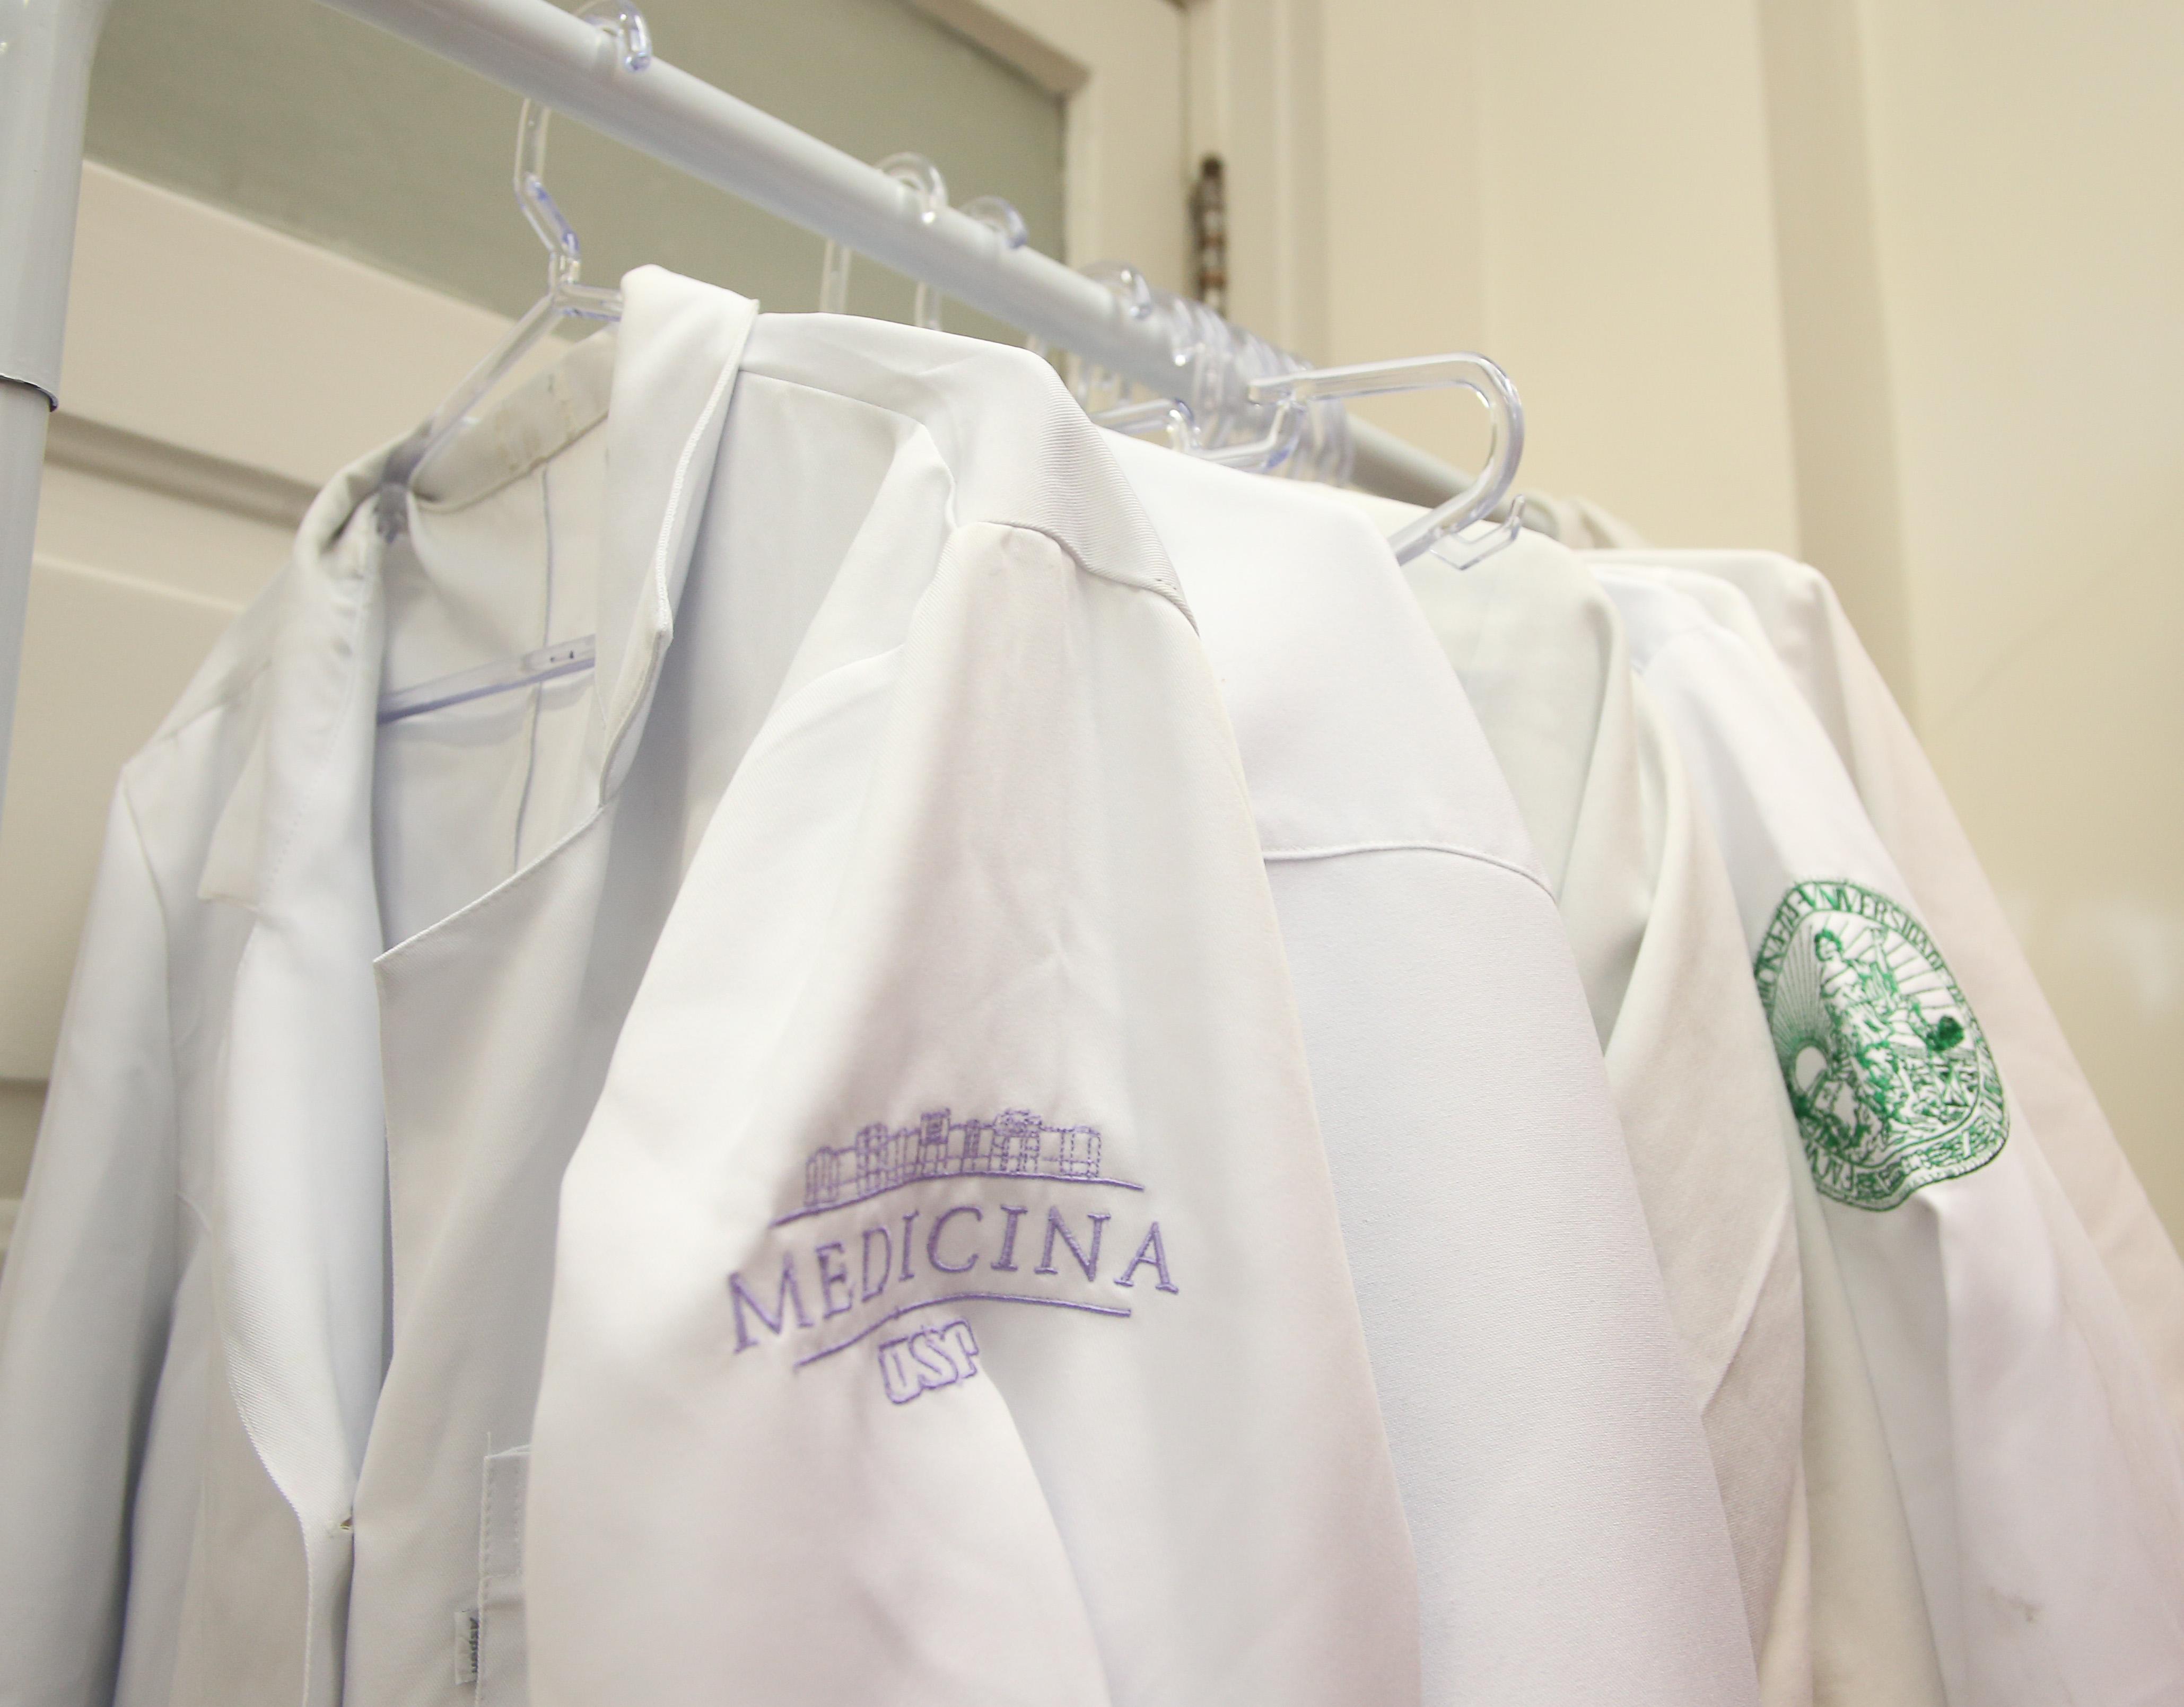 Capas de médicos, avental de médico. foto Cecília Bastos